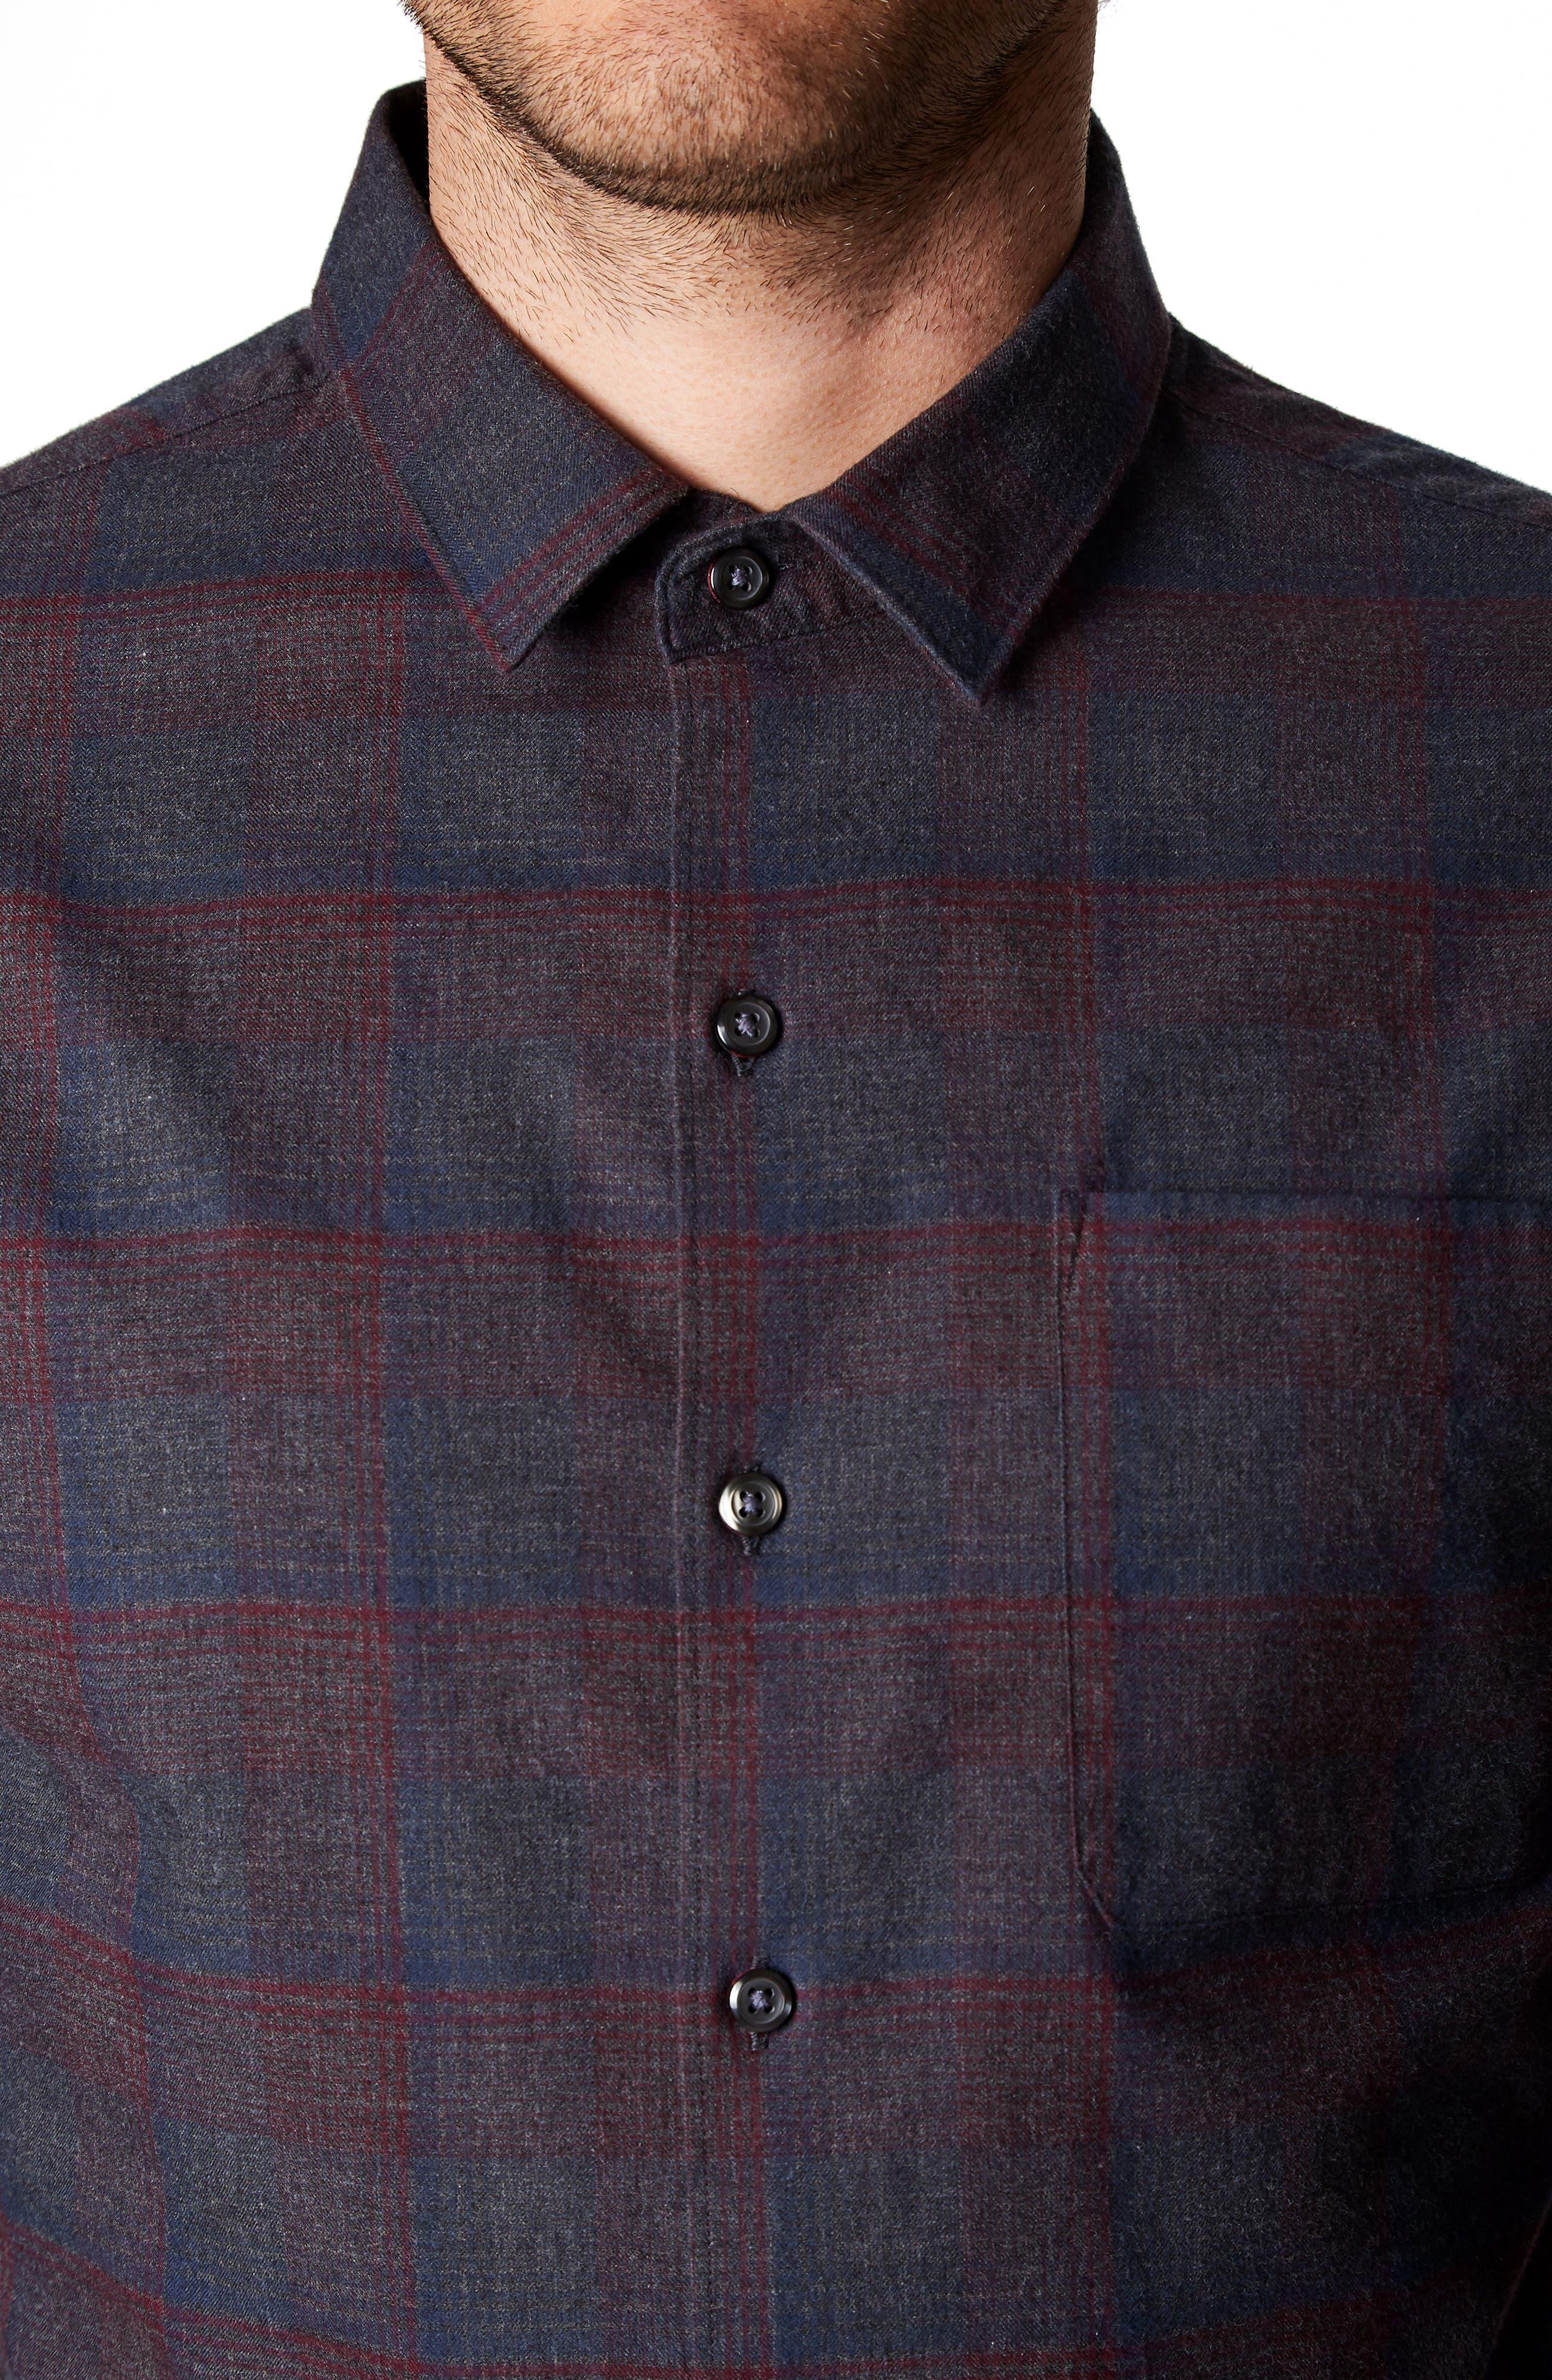 Feel So Good Plaid Shirt,                             Alternate thumbnail 4, color,                             020